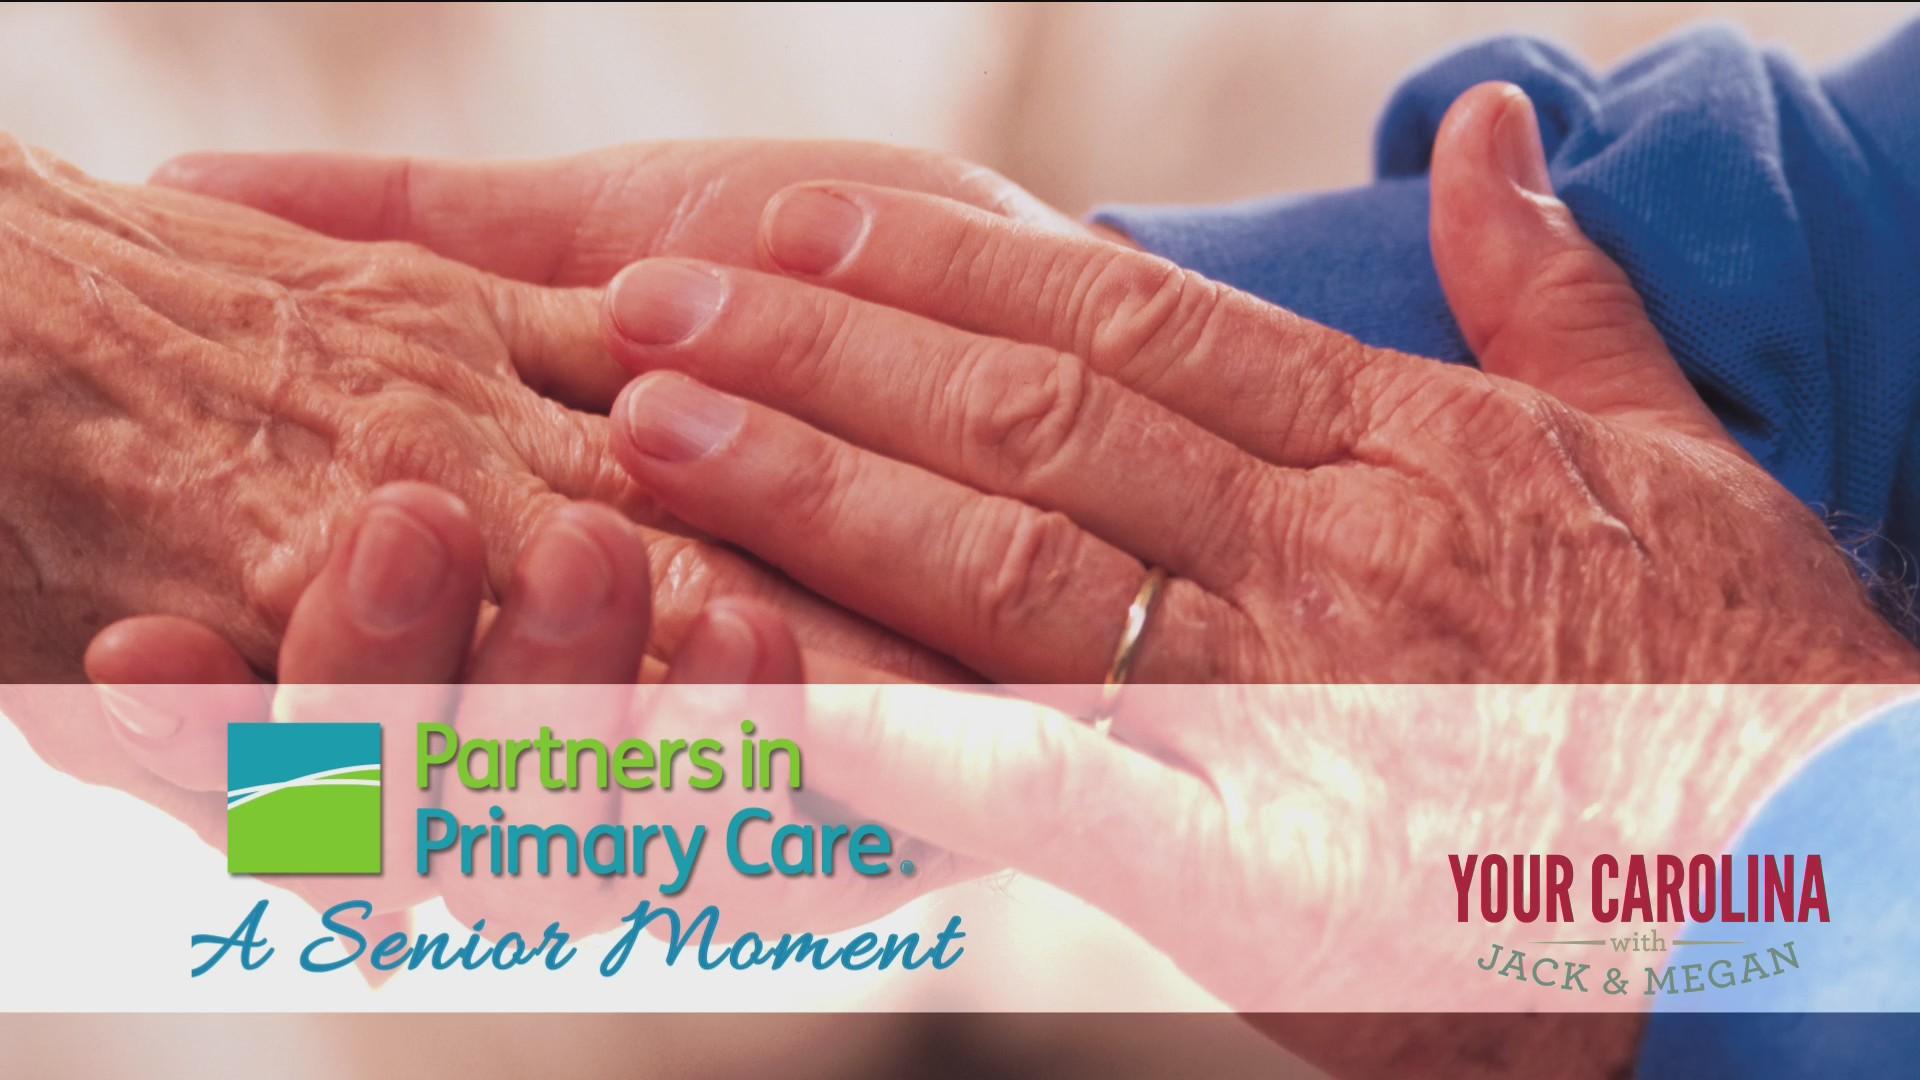 A Senior Moment - Preventive Screenings